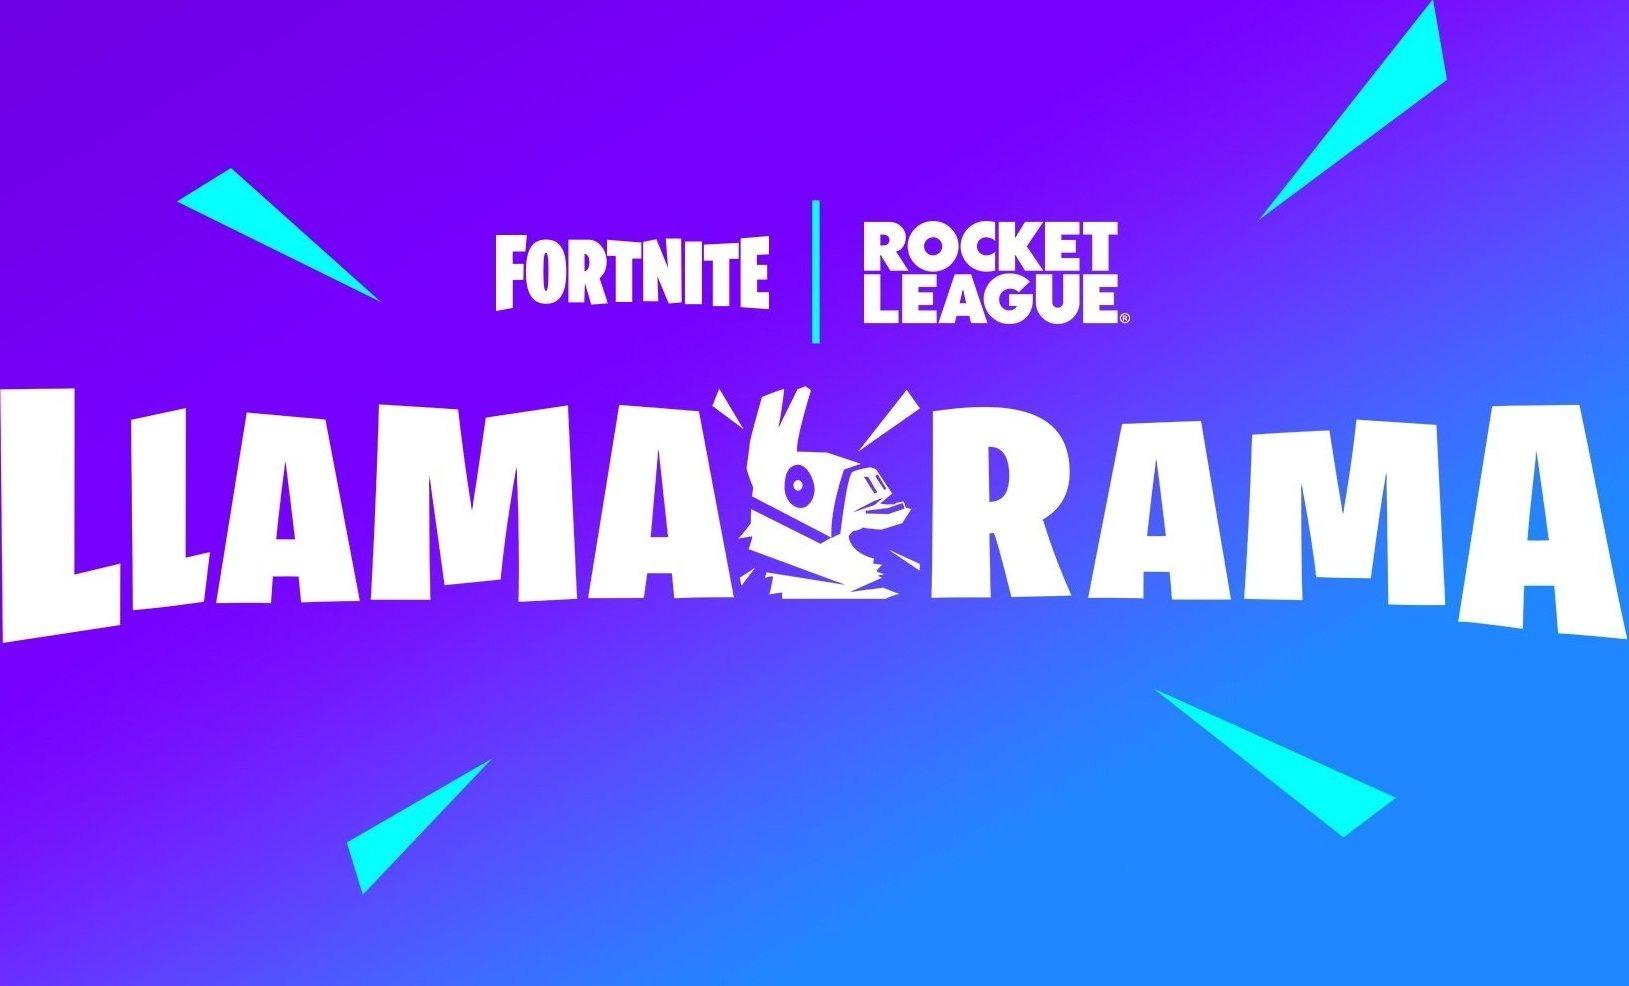 Fortnite: Llama Rama Rocket League Event - Kaskada Concert, Rewards, Start Date